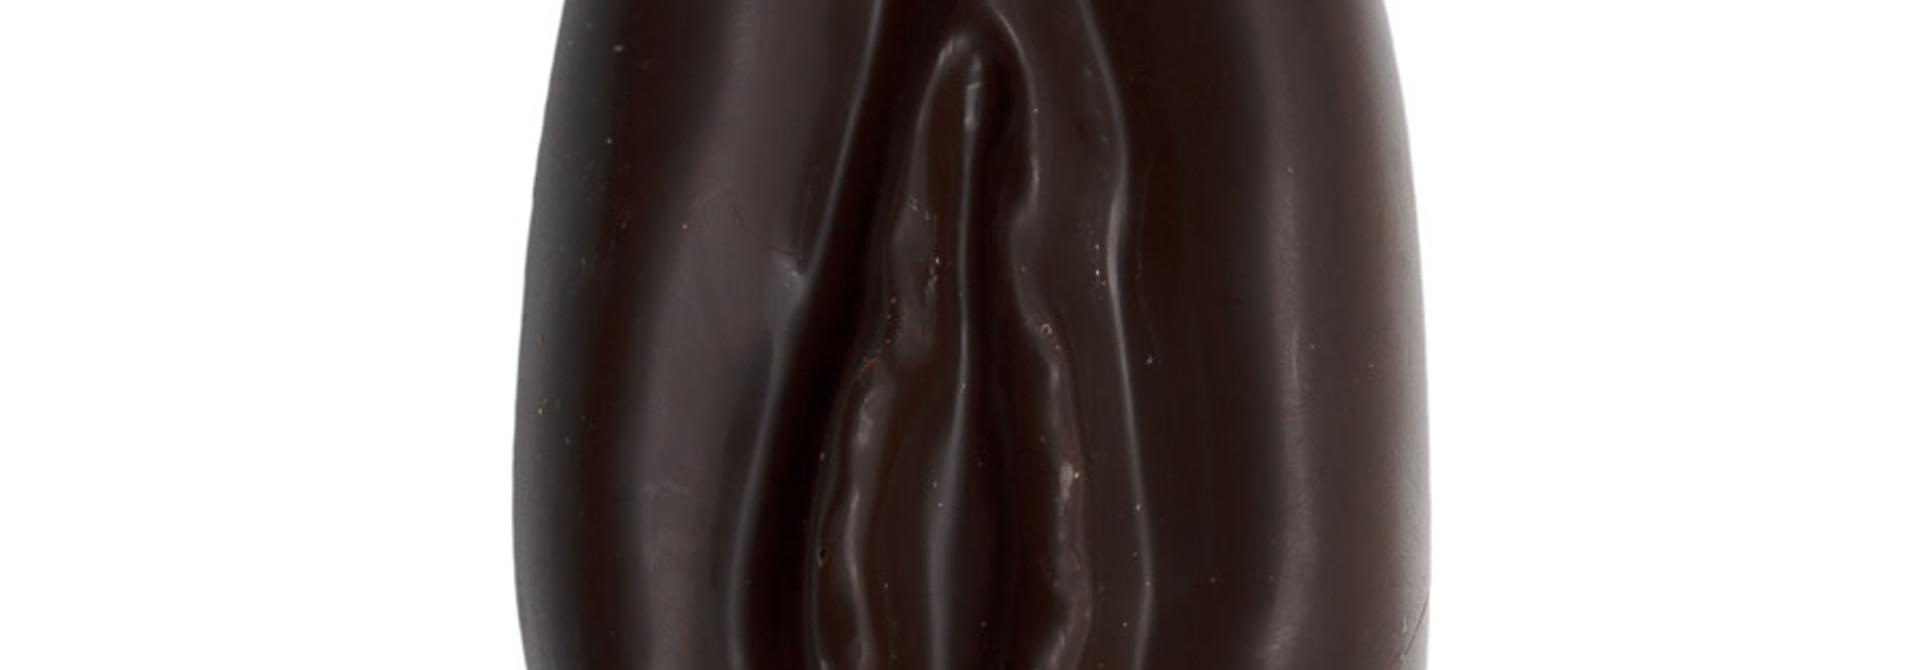 Pussy lollipop (dark)